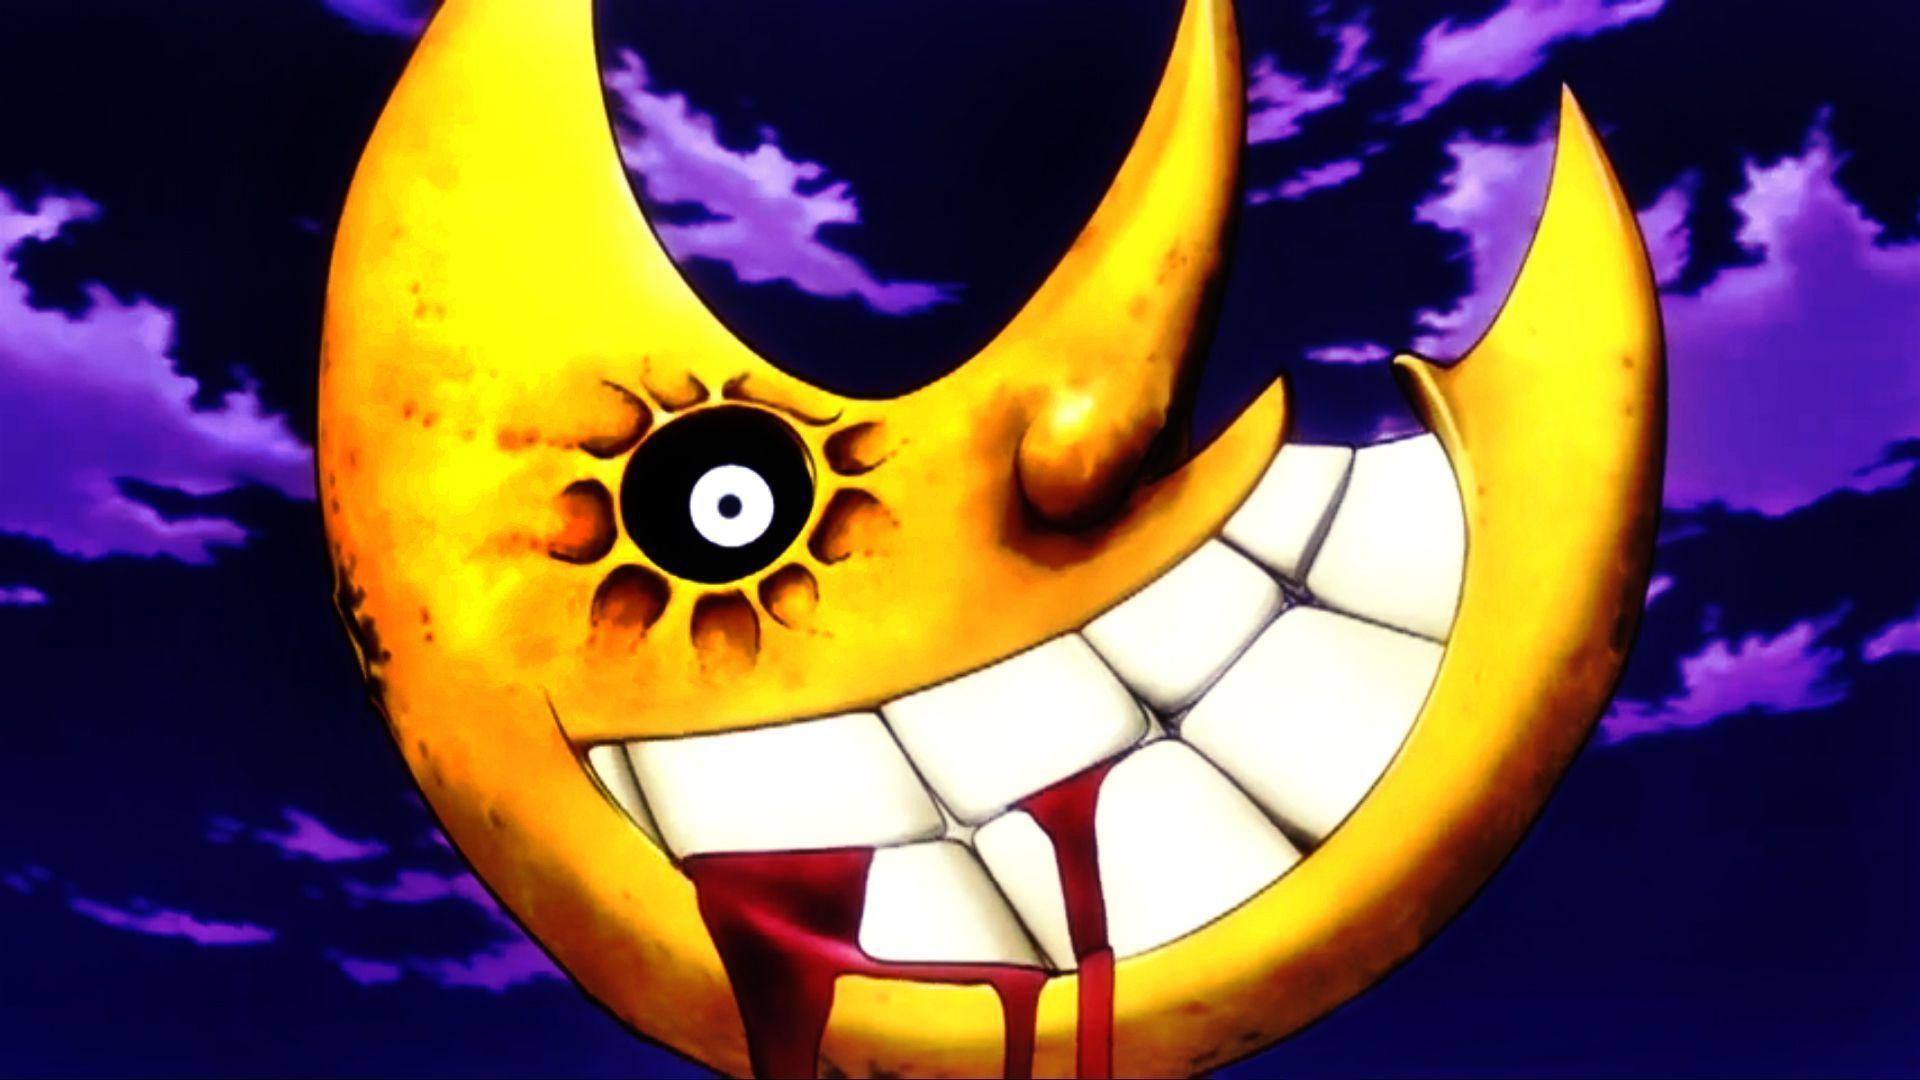 soul eater moon iphone -#main